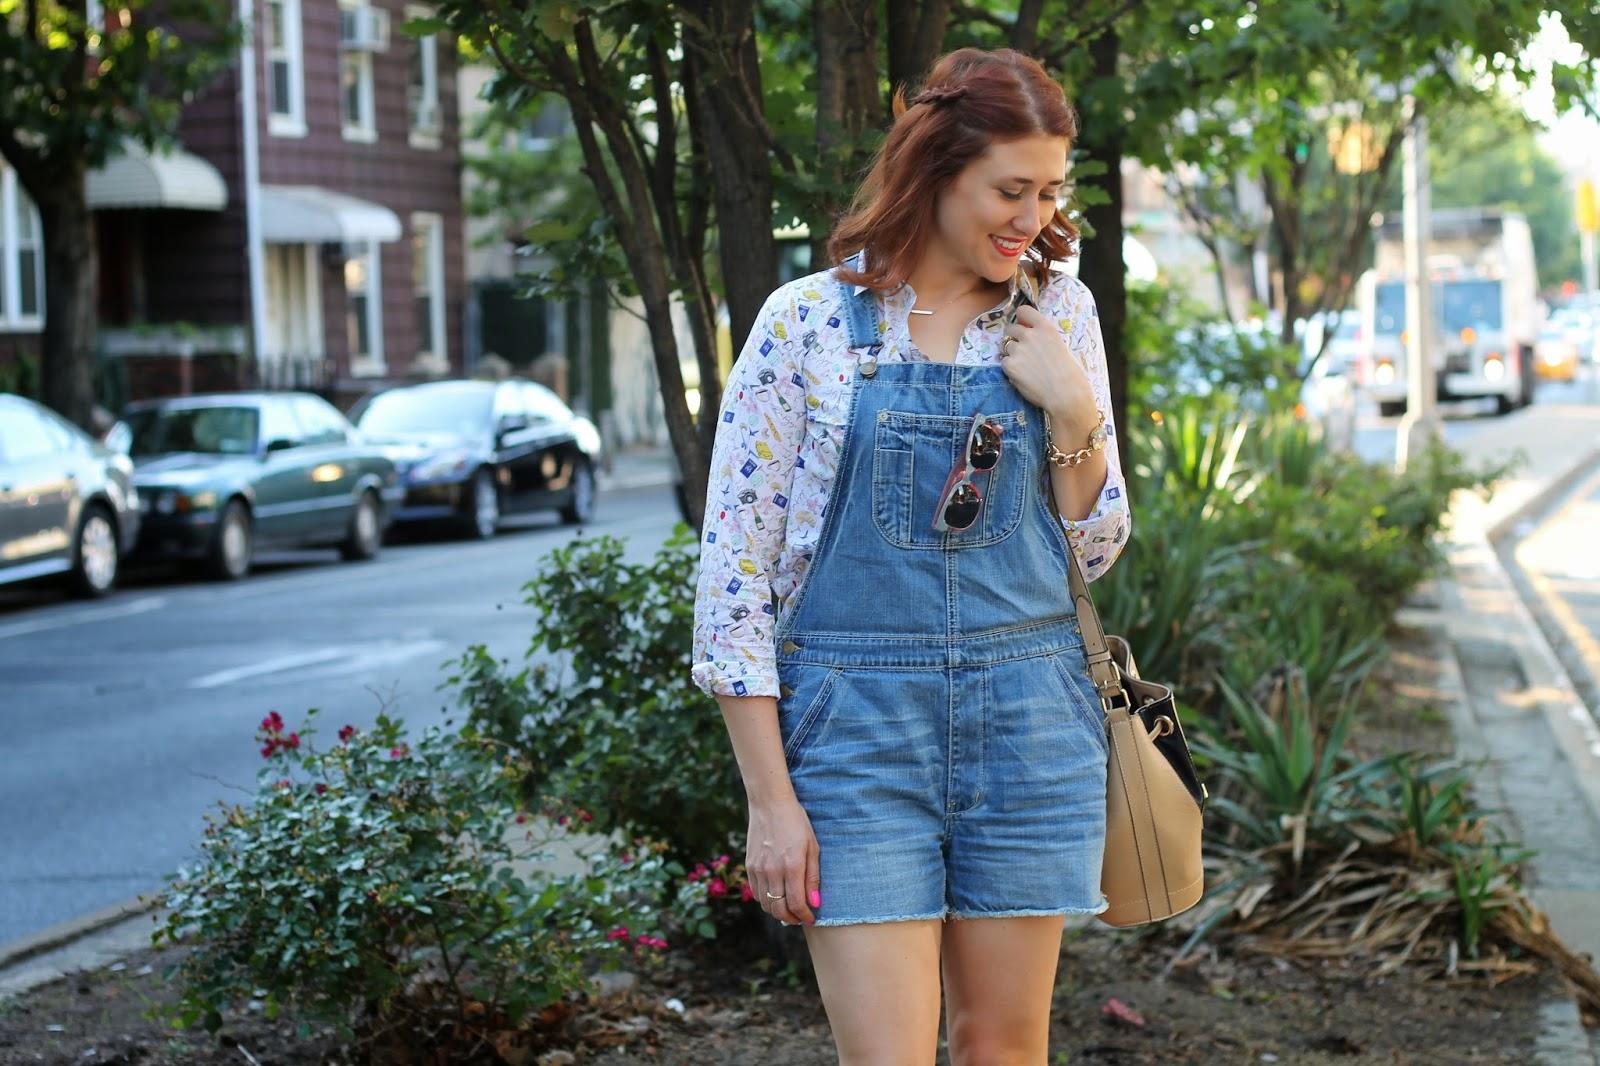 overalls, shortalls